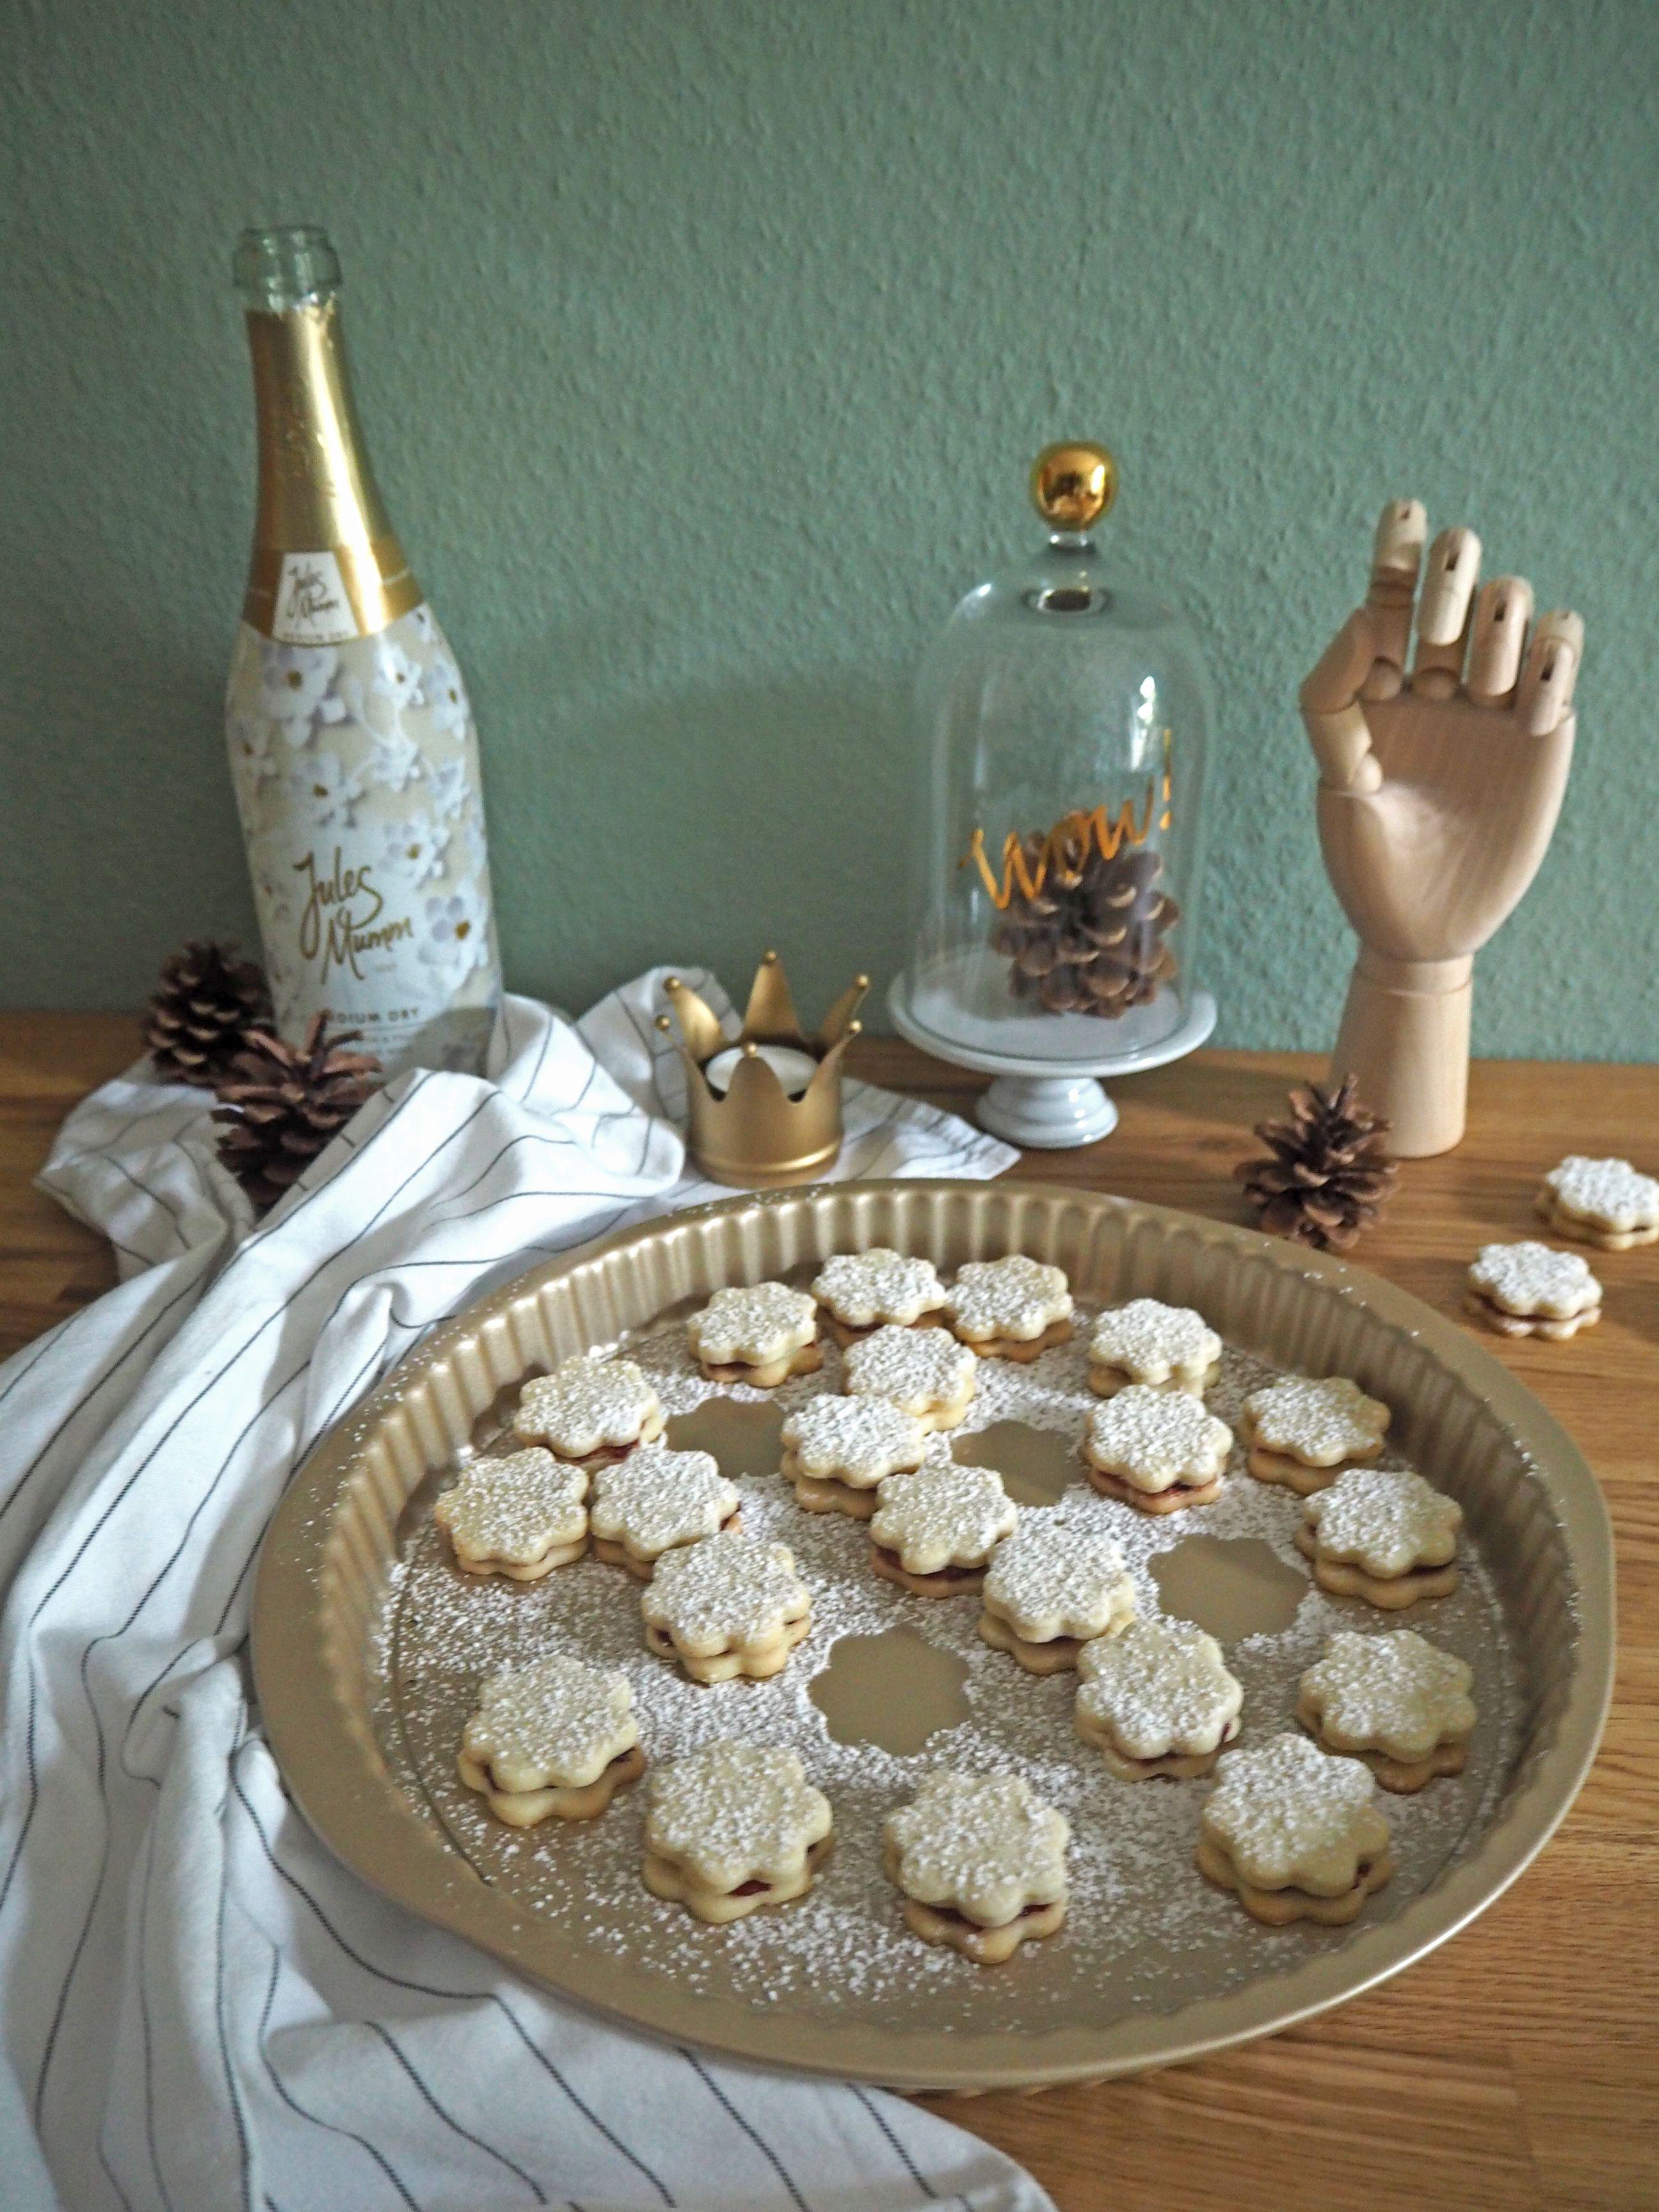 2018-skoen-och-kreativ-food-god-jul-plaetzchen-vanille-cookies-mit-marmelade (10)